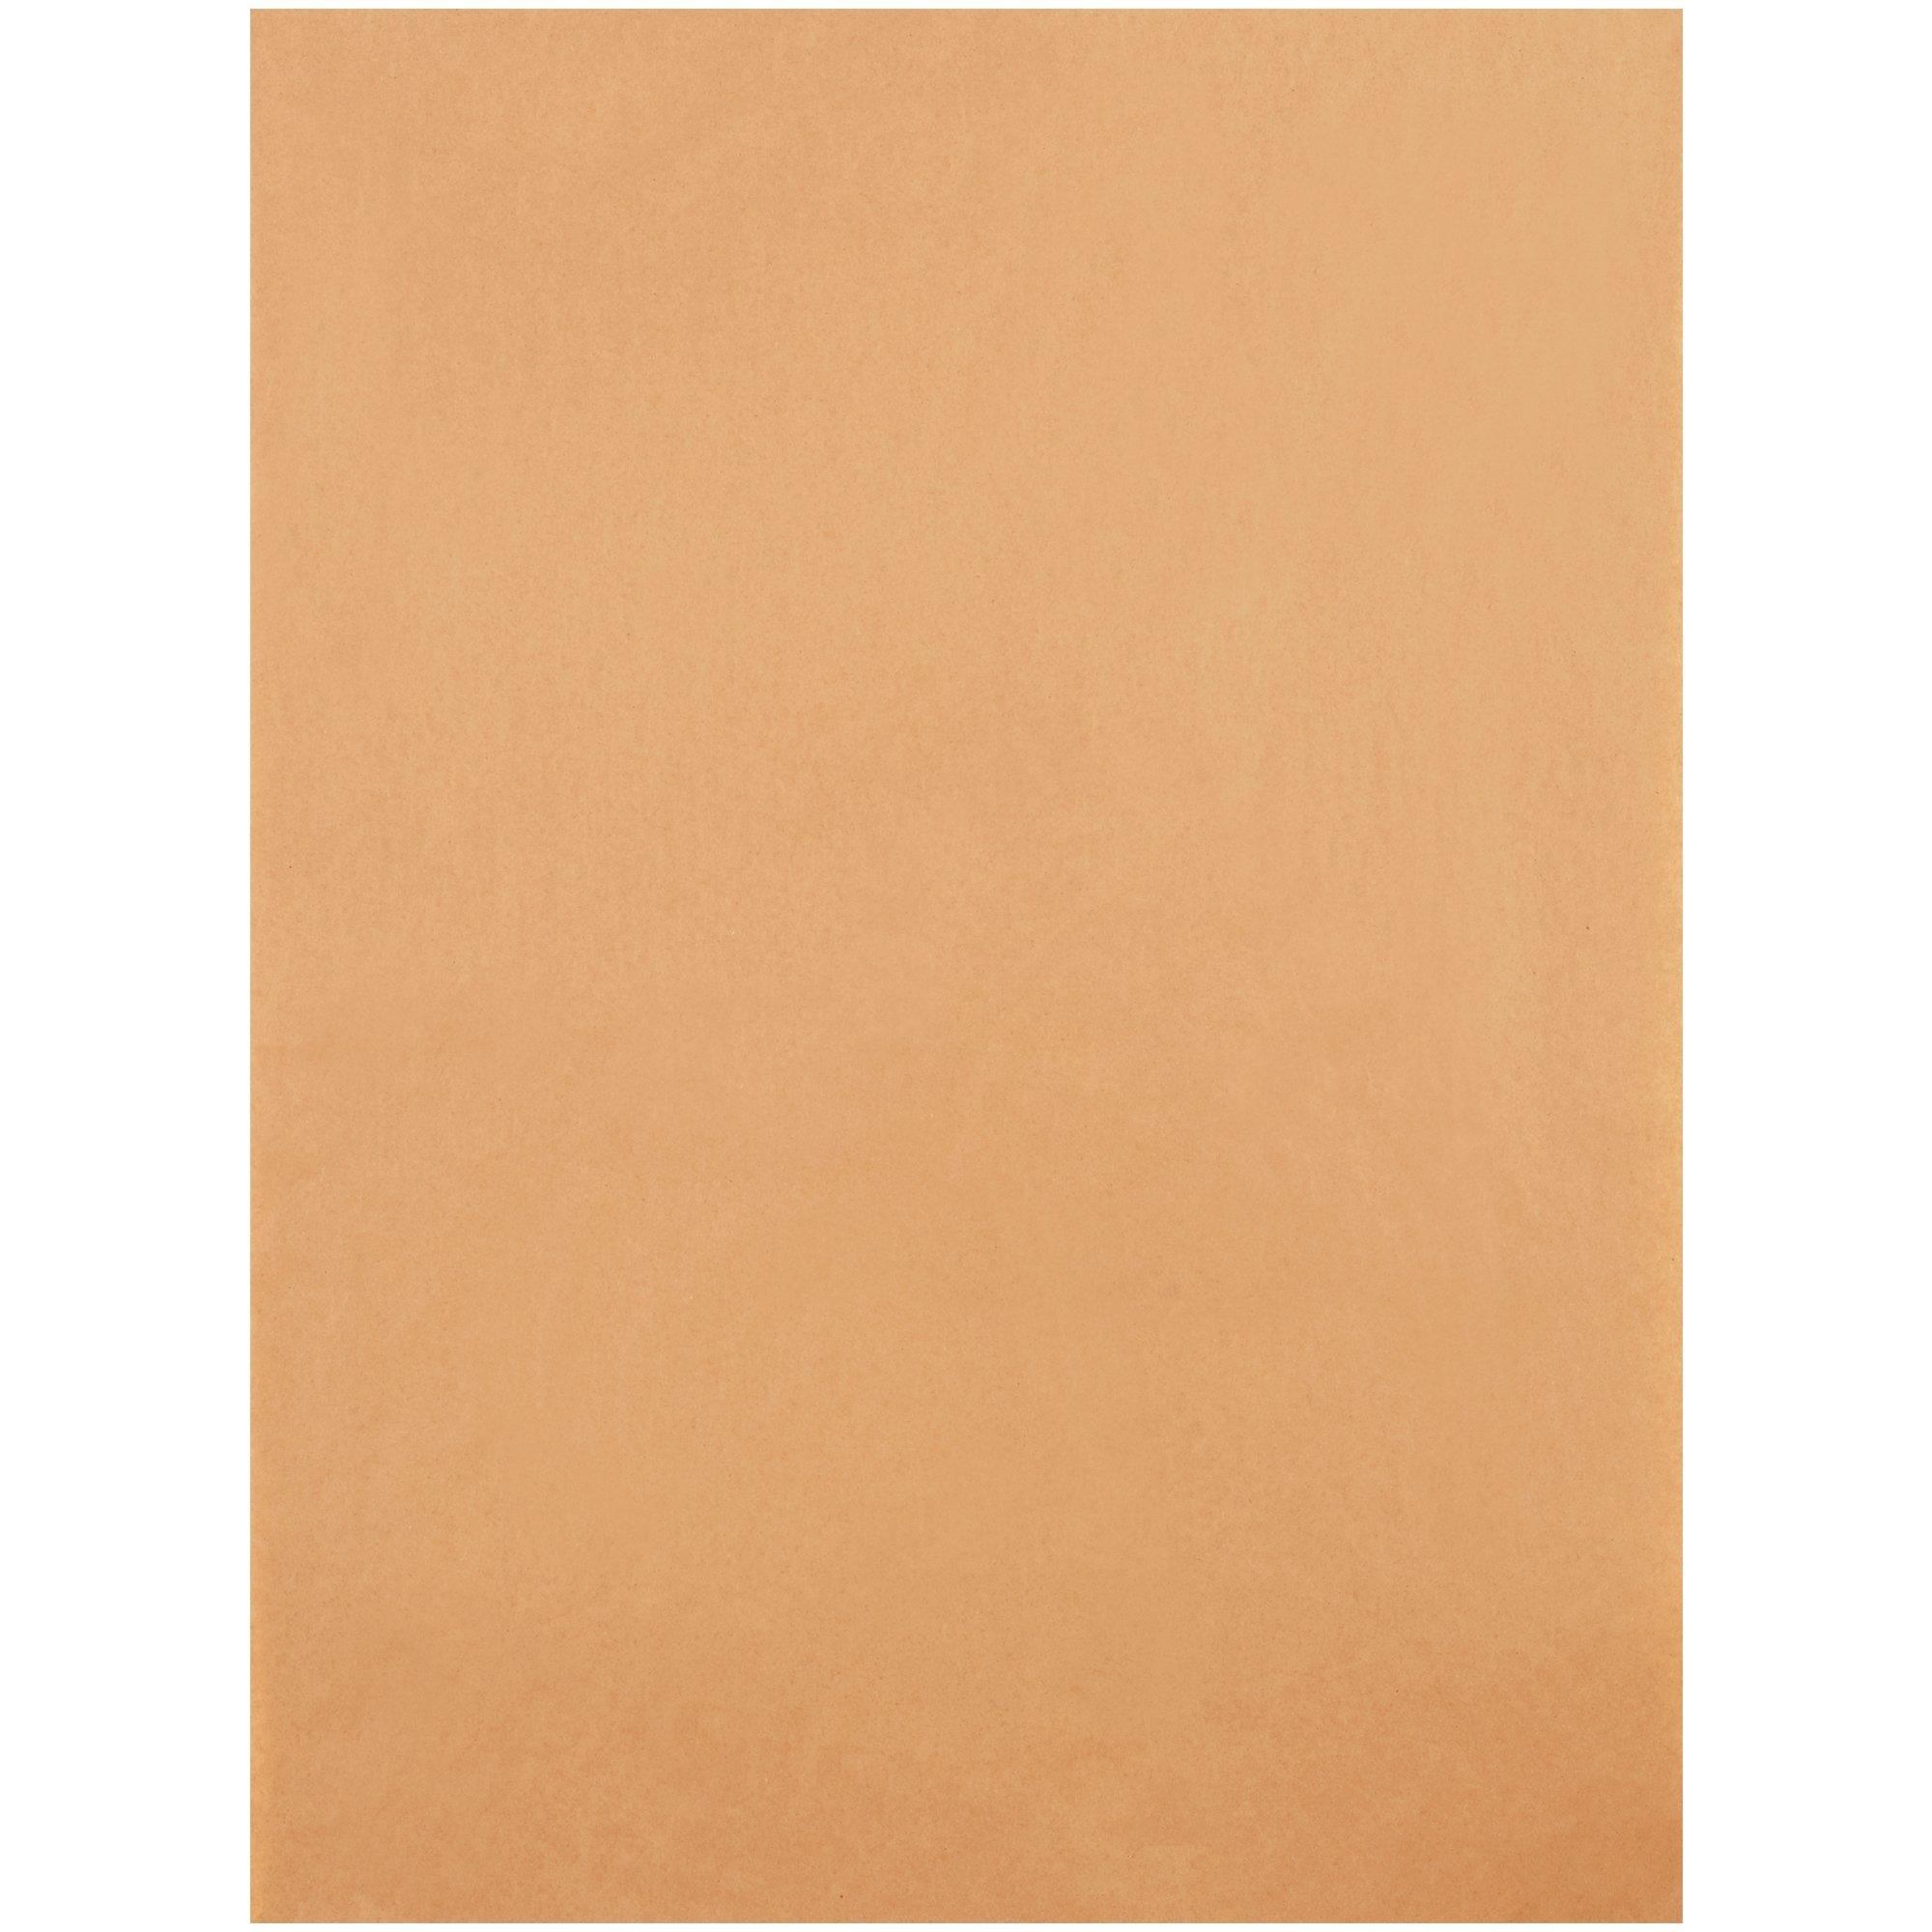 Aviditi 100% Recycled Fiber Paper Sheet, 48'' L x 36'' W, Kraft, Case of 312 (KPS364840)